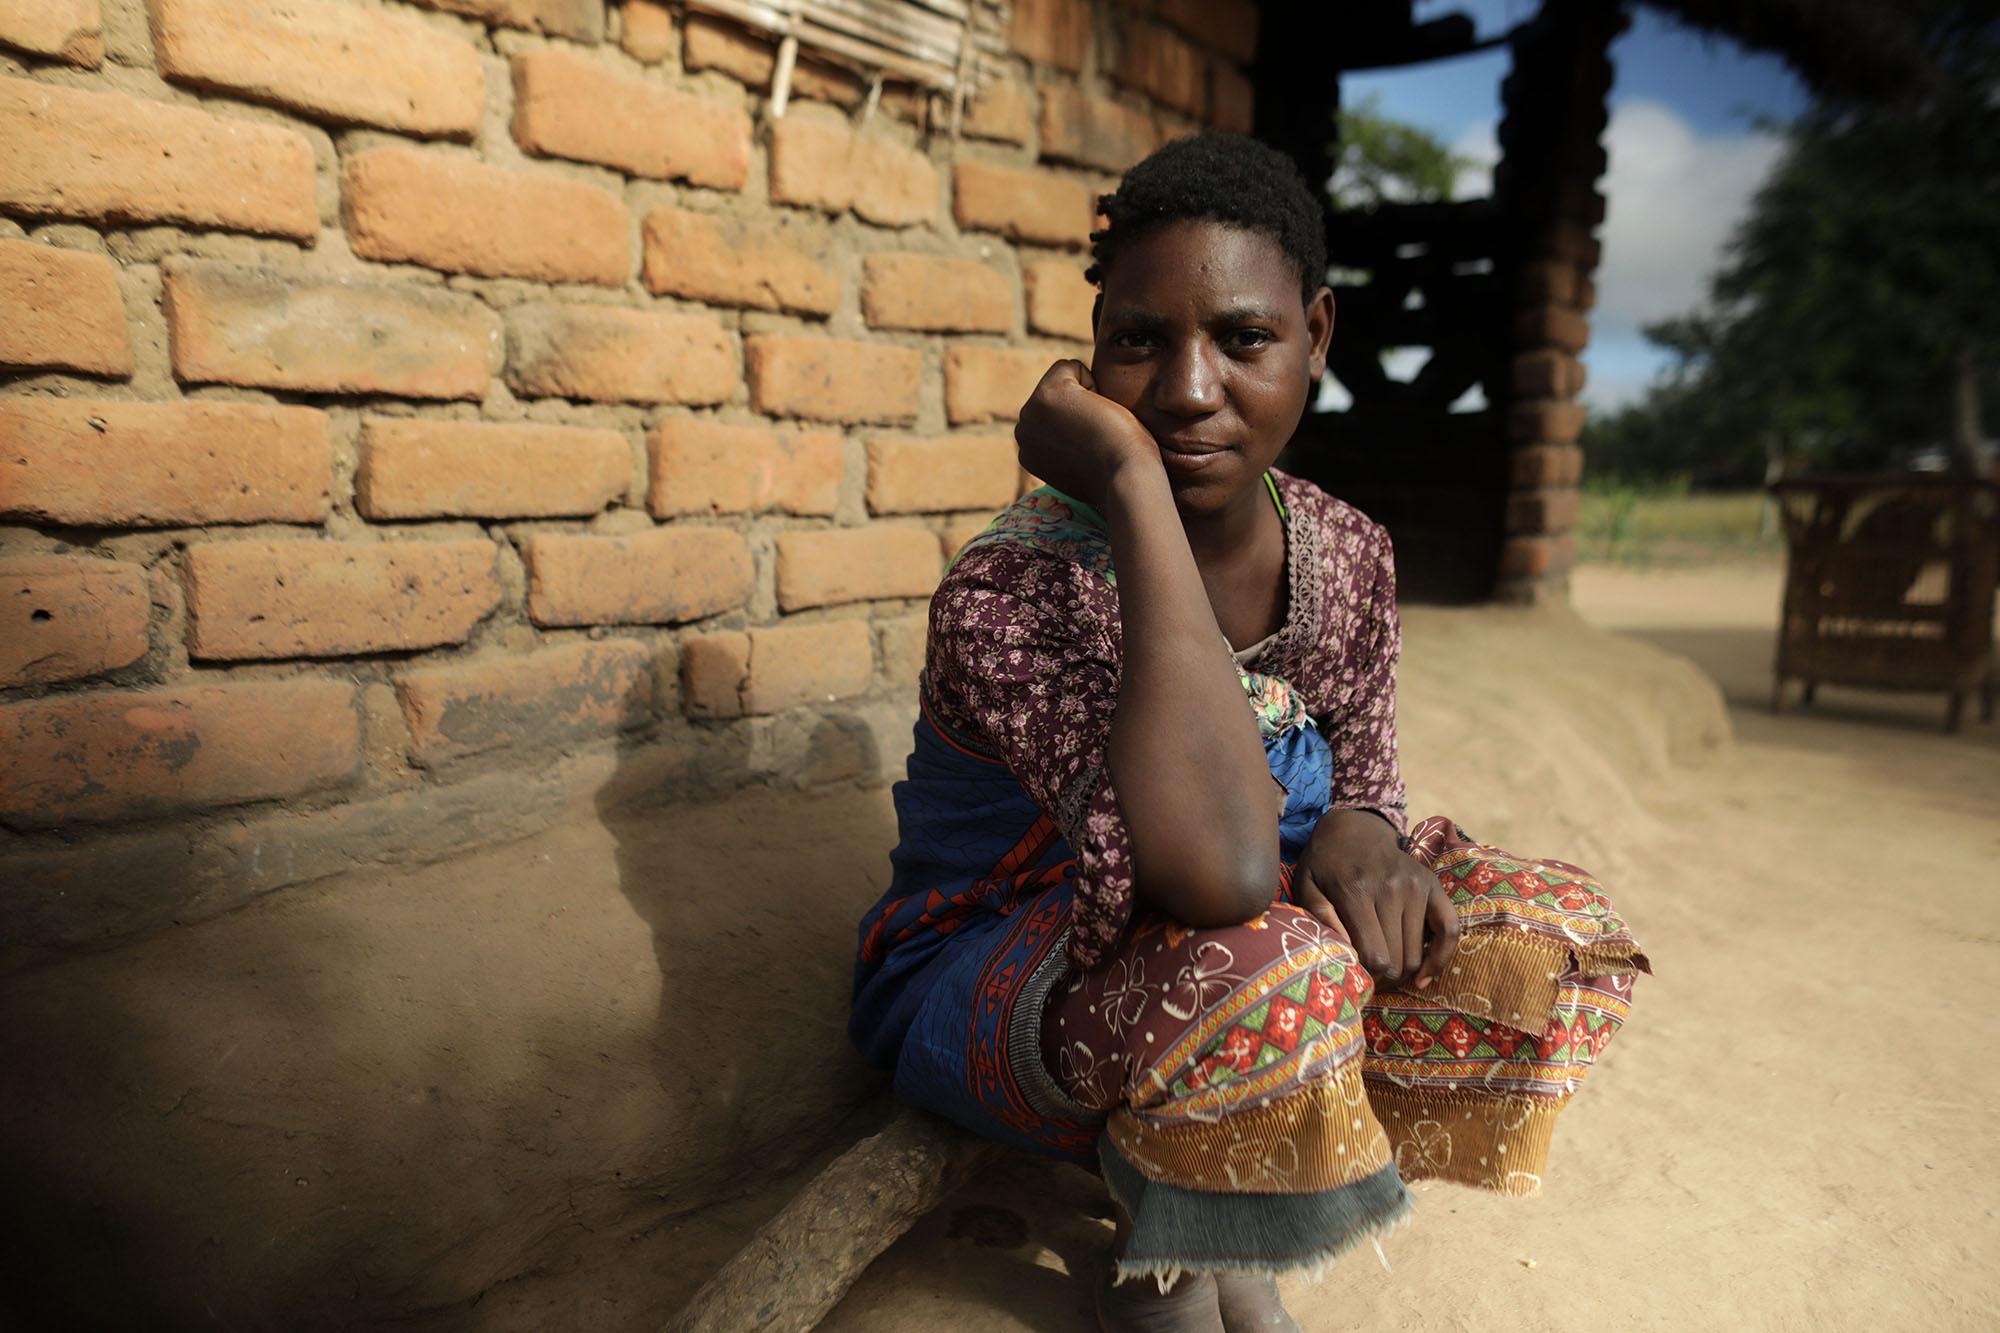 Mariam Chinguwo. Photo by Josh Estey.